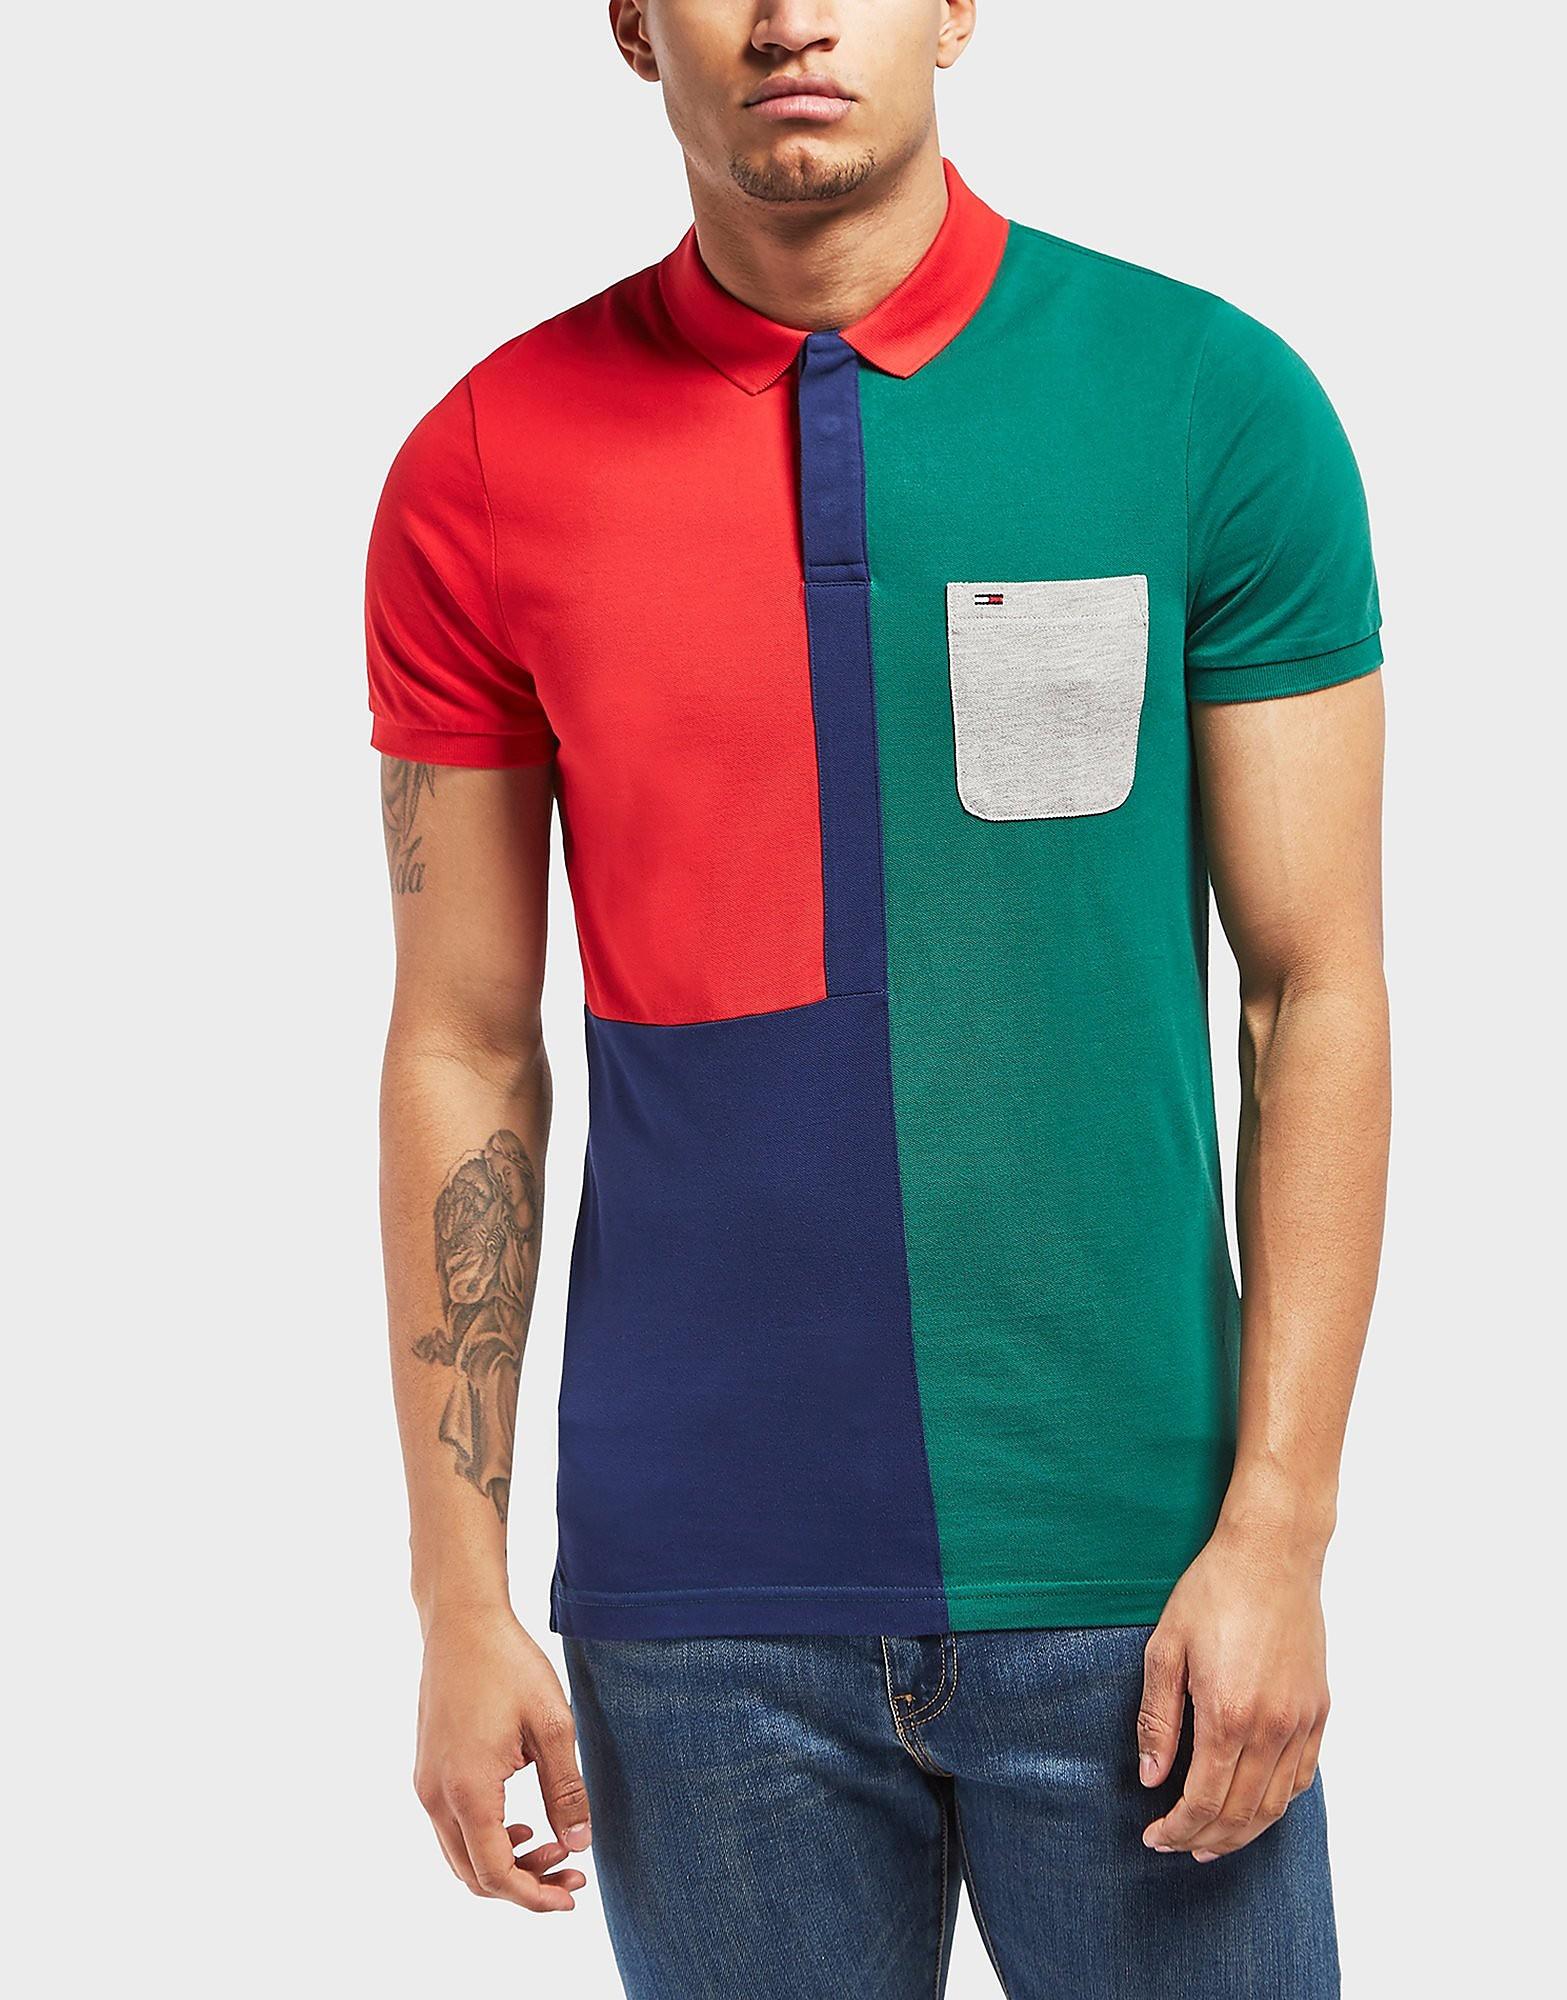 Tommy Hilfiger Vintage Block Short Sleeve Polo Shirt